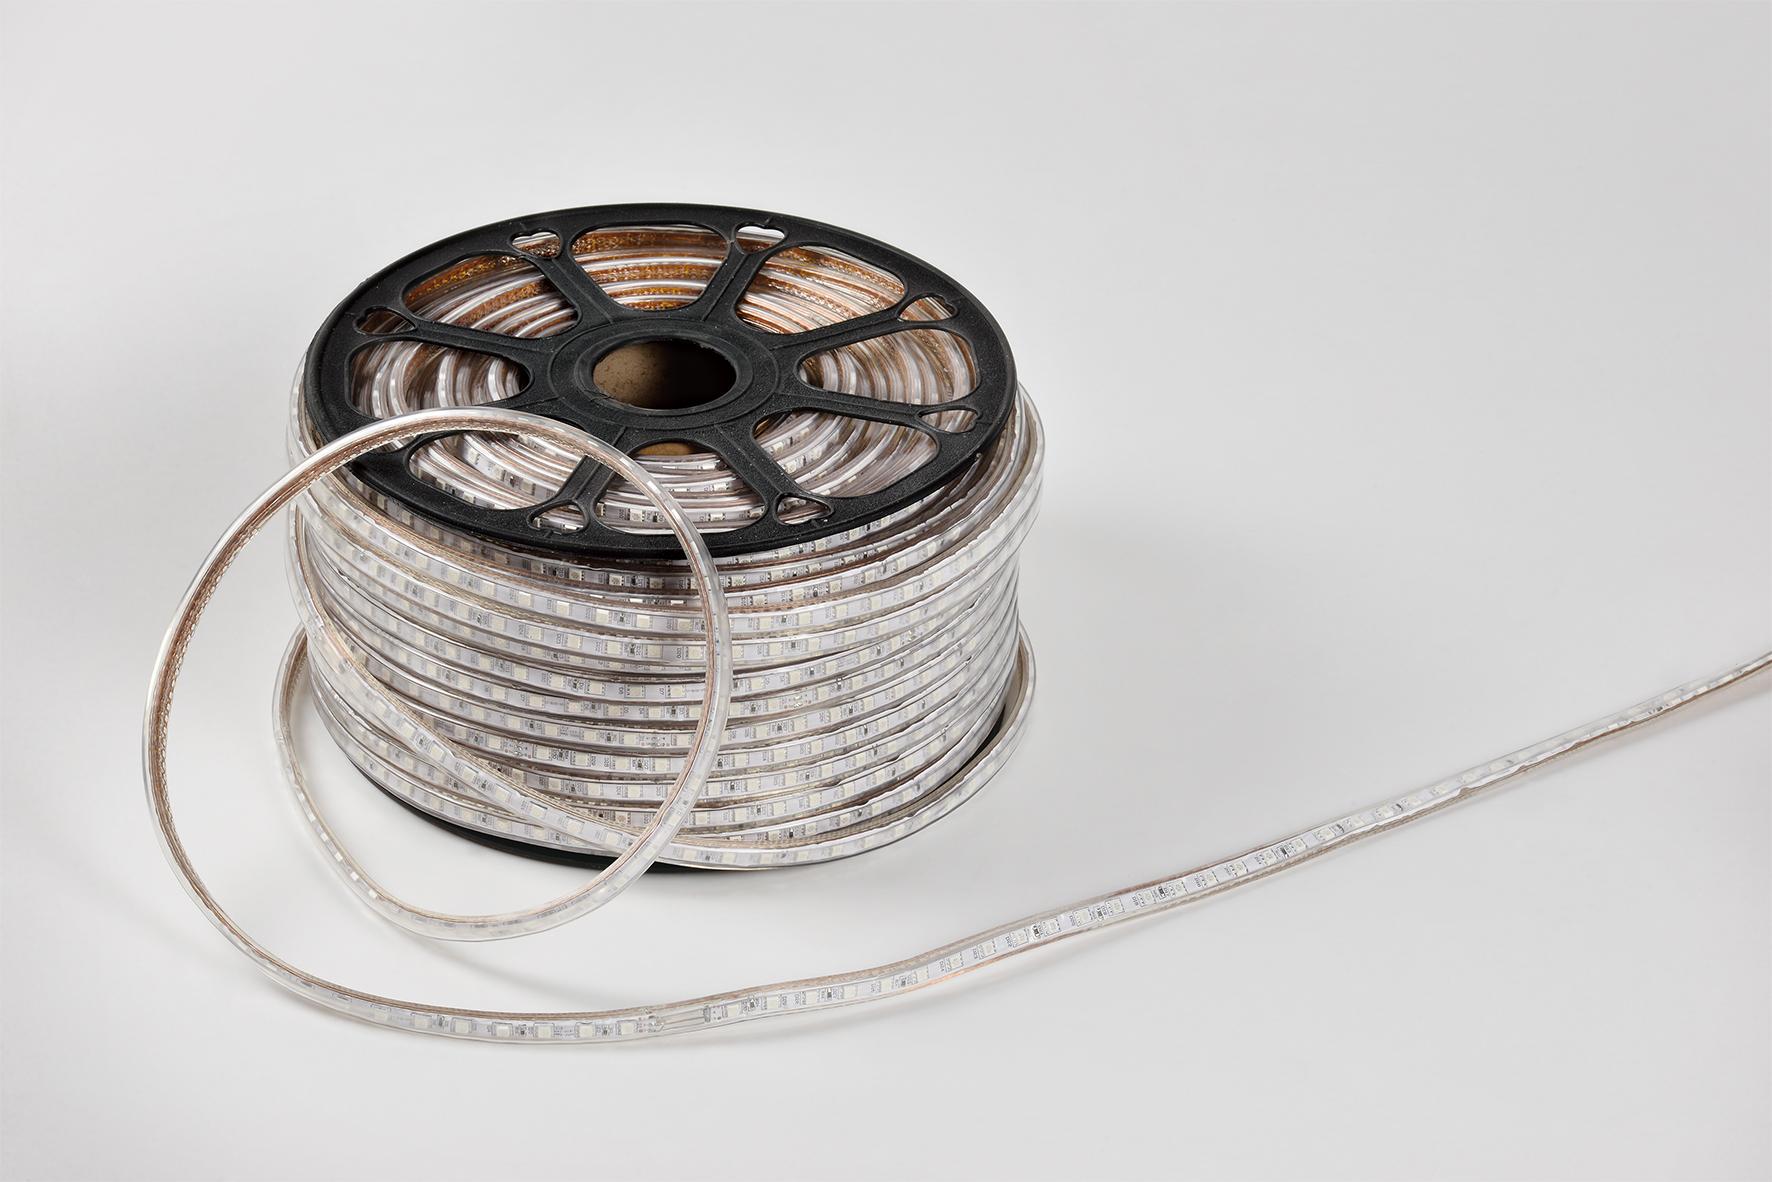 LED Strip 3000K Warmweiß in 100m Lighting 60LEDs LED Leiste IP65 wasserdichte inkl.Trafo